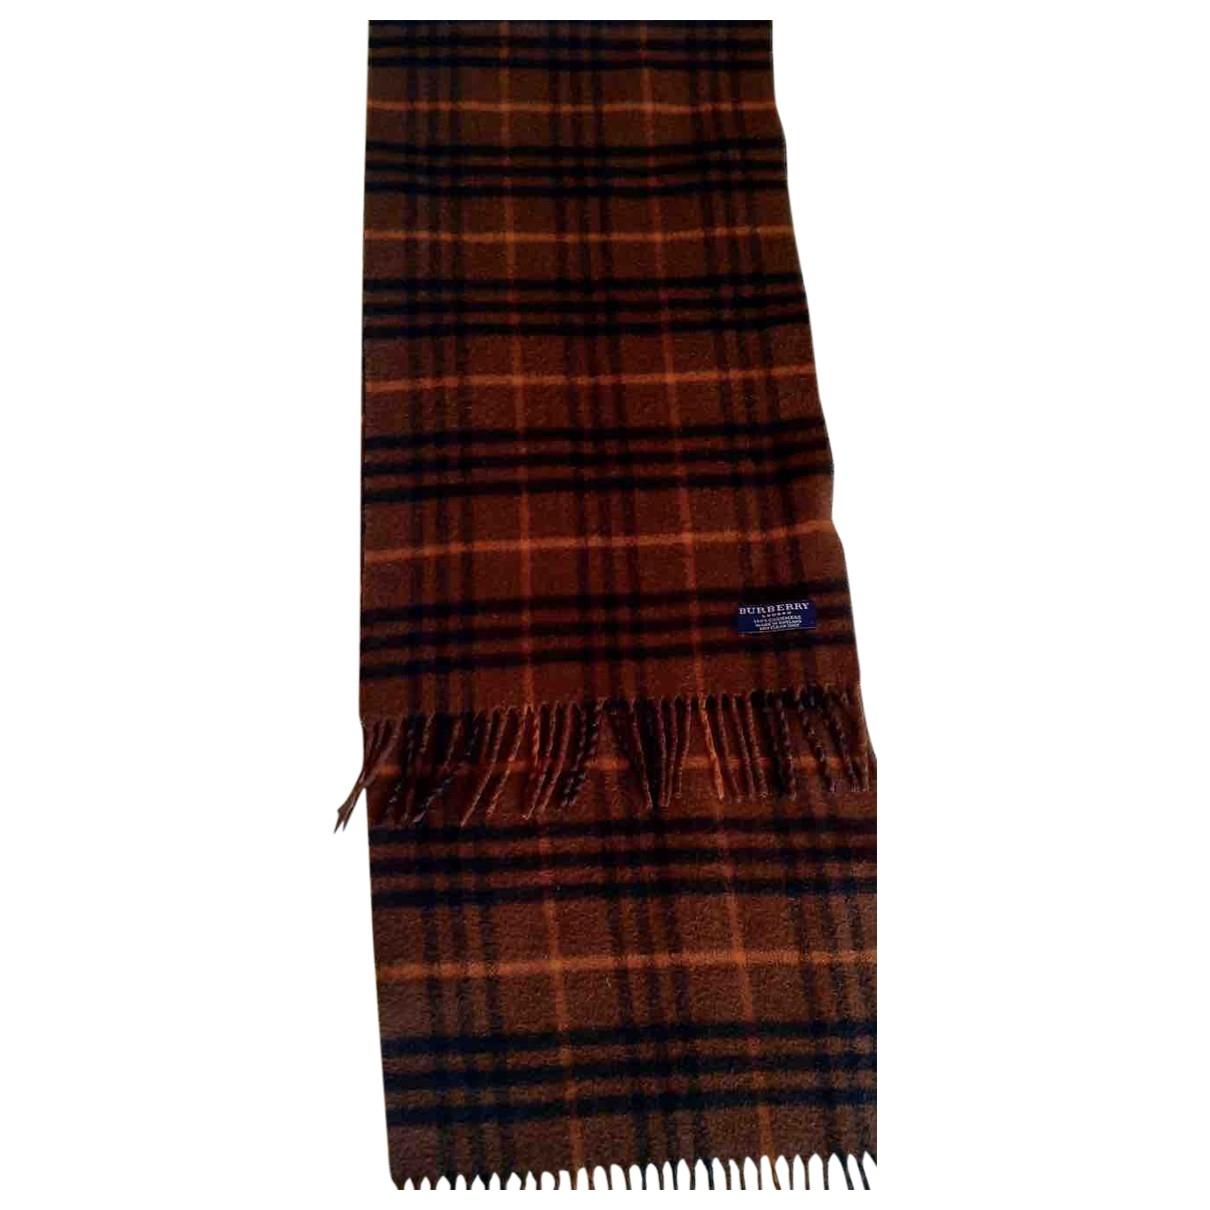 Pañuelo / bufanda de Cachemira Burberry